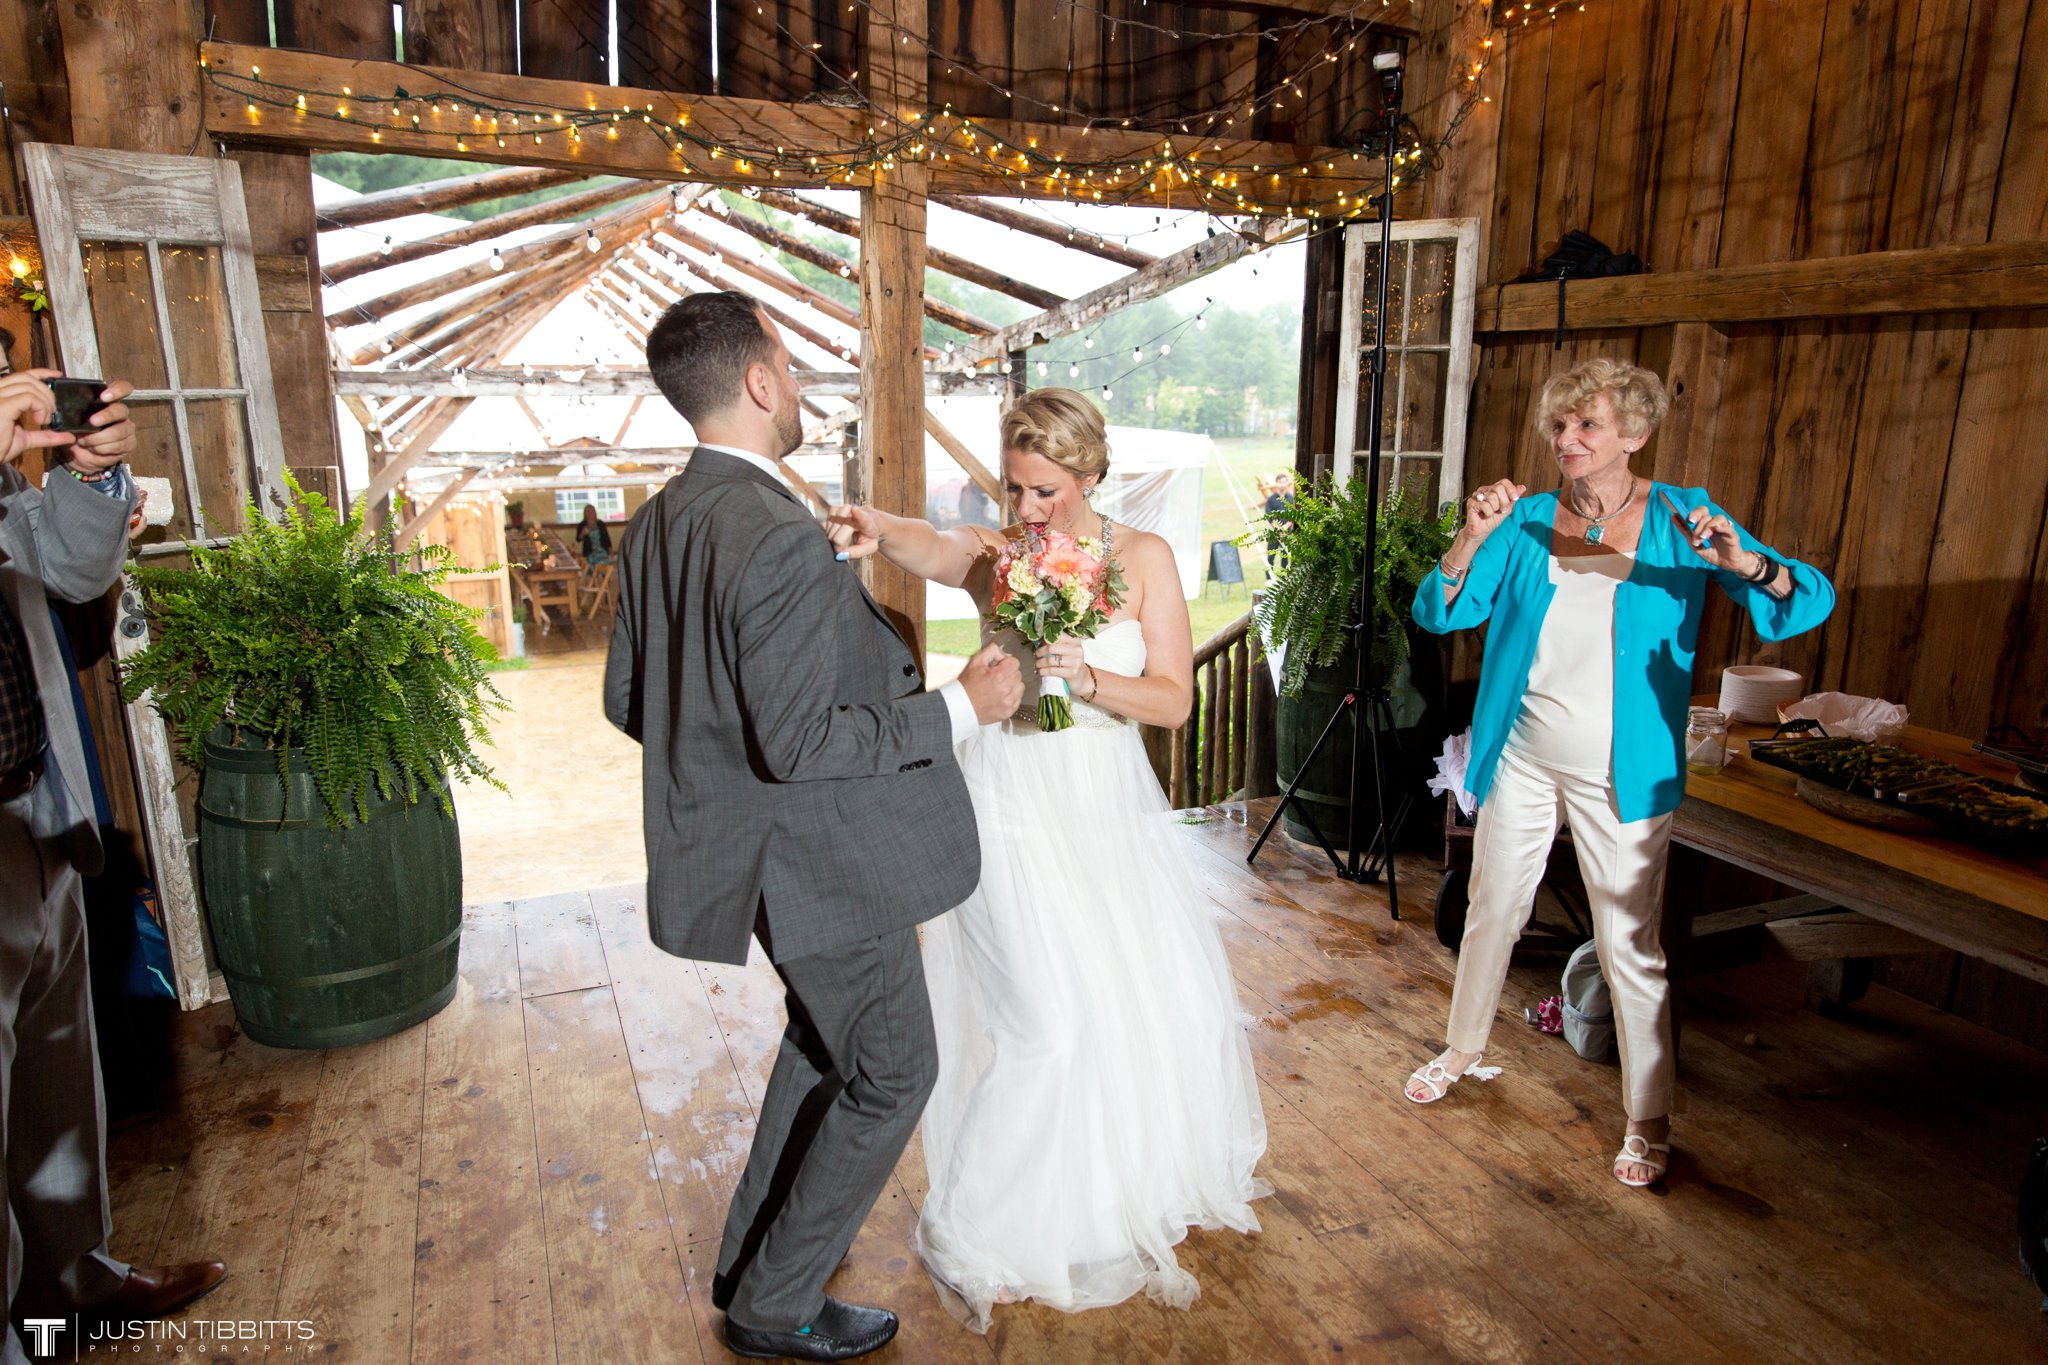 burlap-and-beams-wedding-photos-with-joran-and-molly_0101